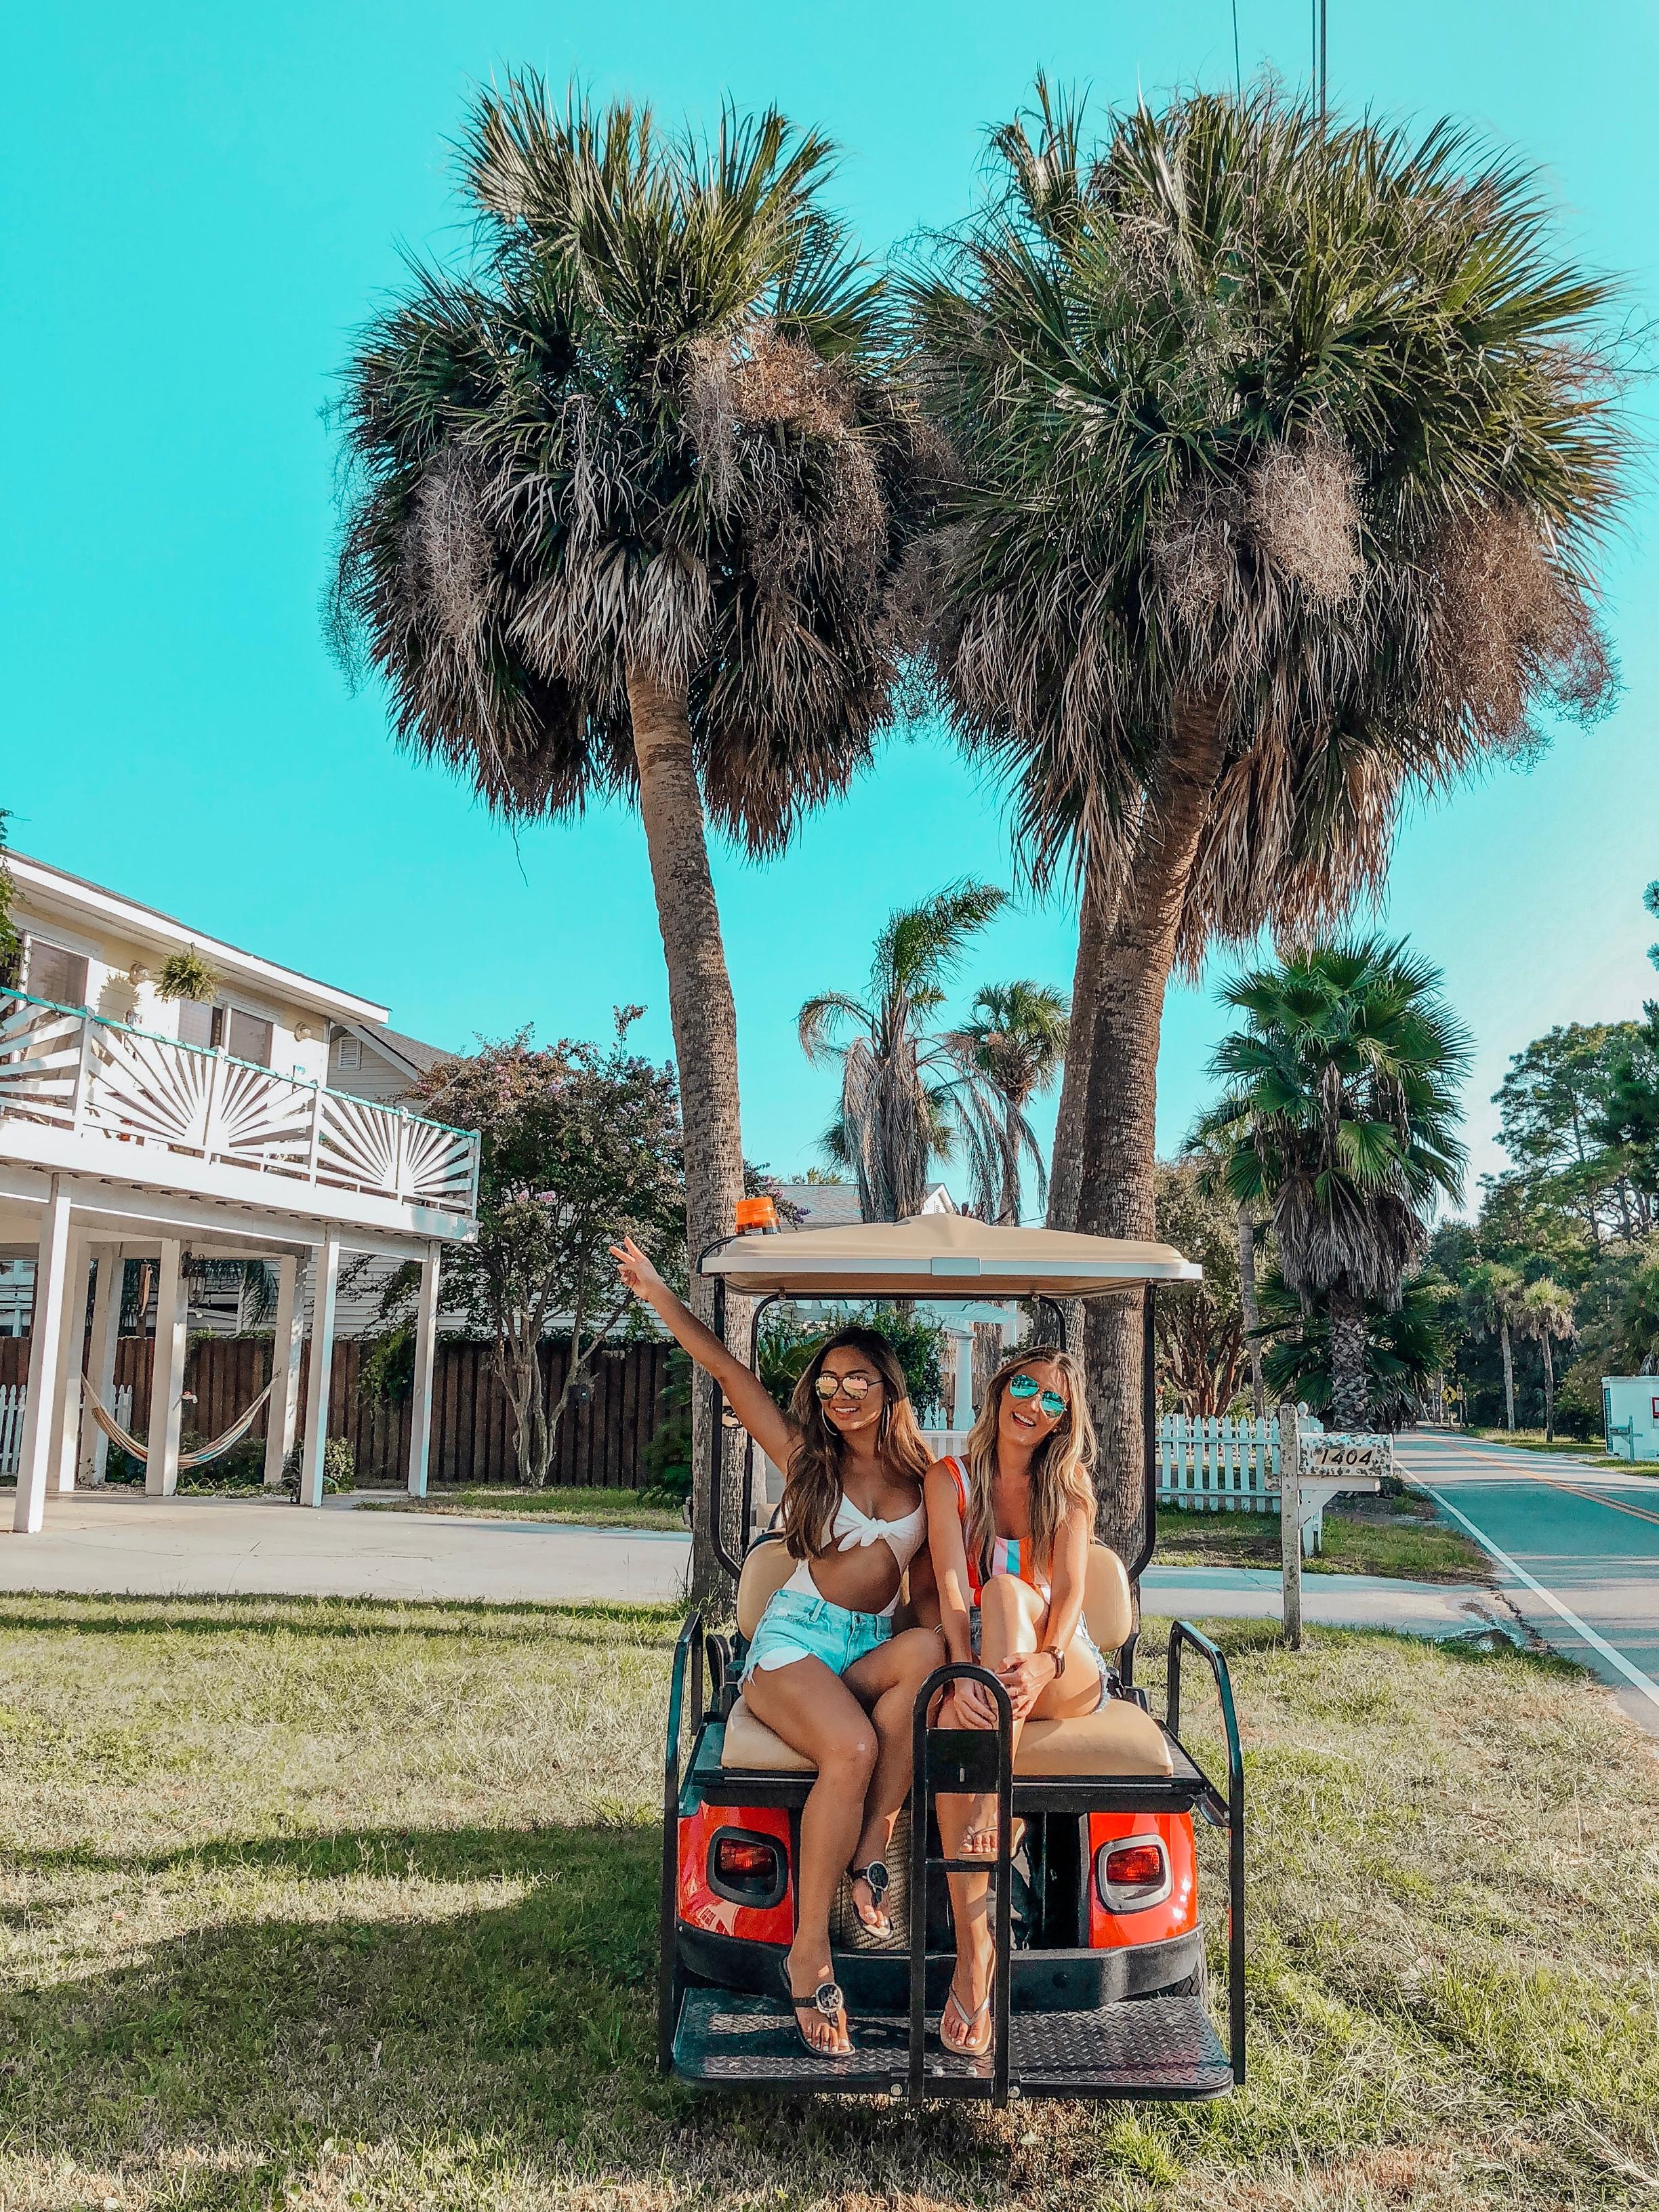 Little Tybee Island – Savannah's Beach